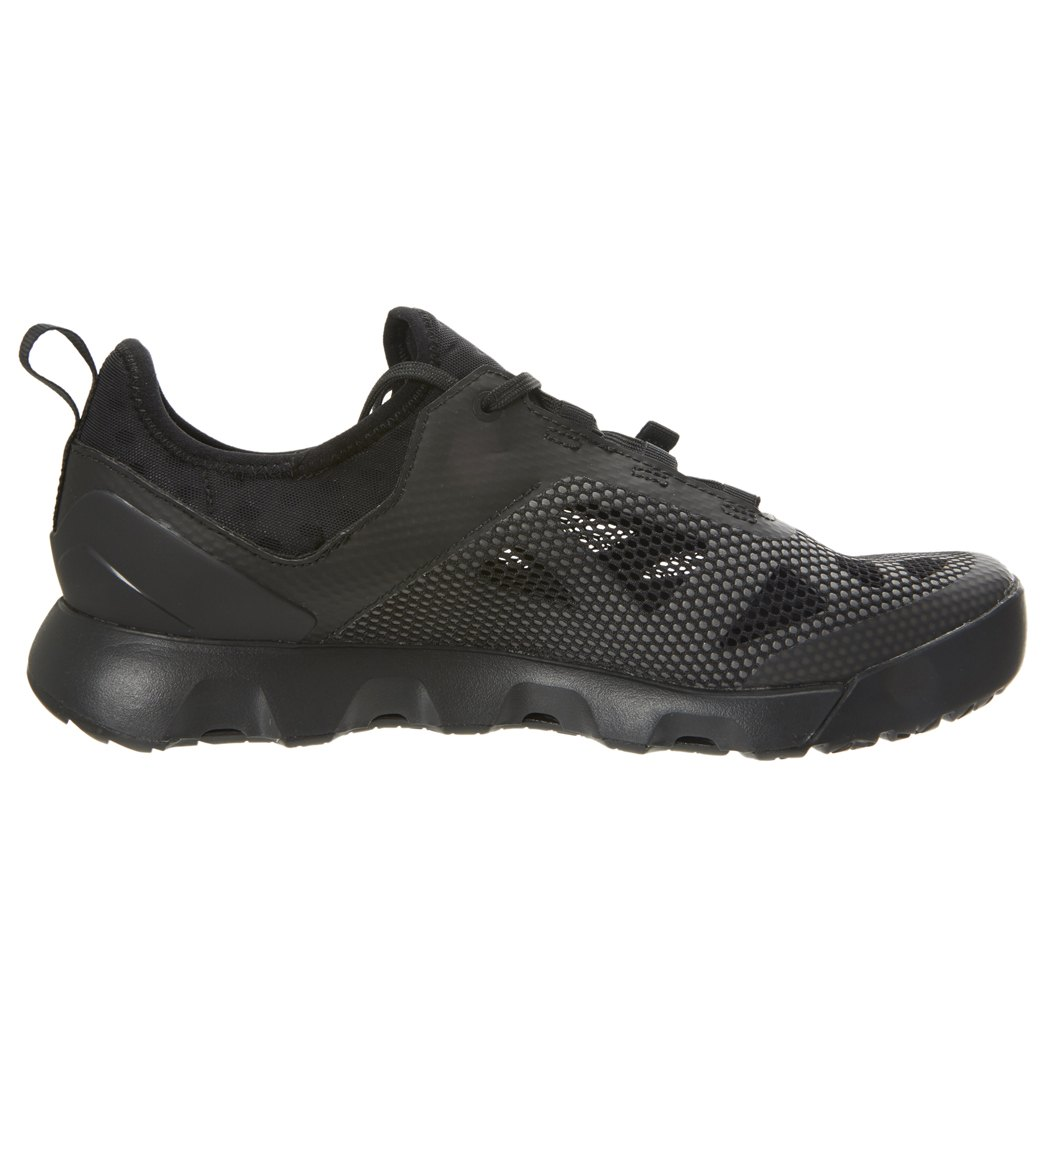 Adidas Men s Terrex Climacool Voyager Aqua Water Shoe at SwimOutlet ... 22e47704e